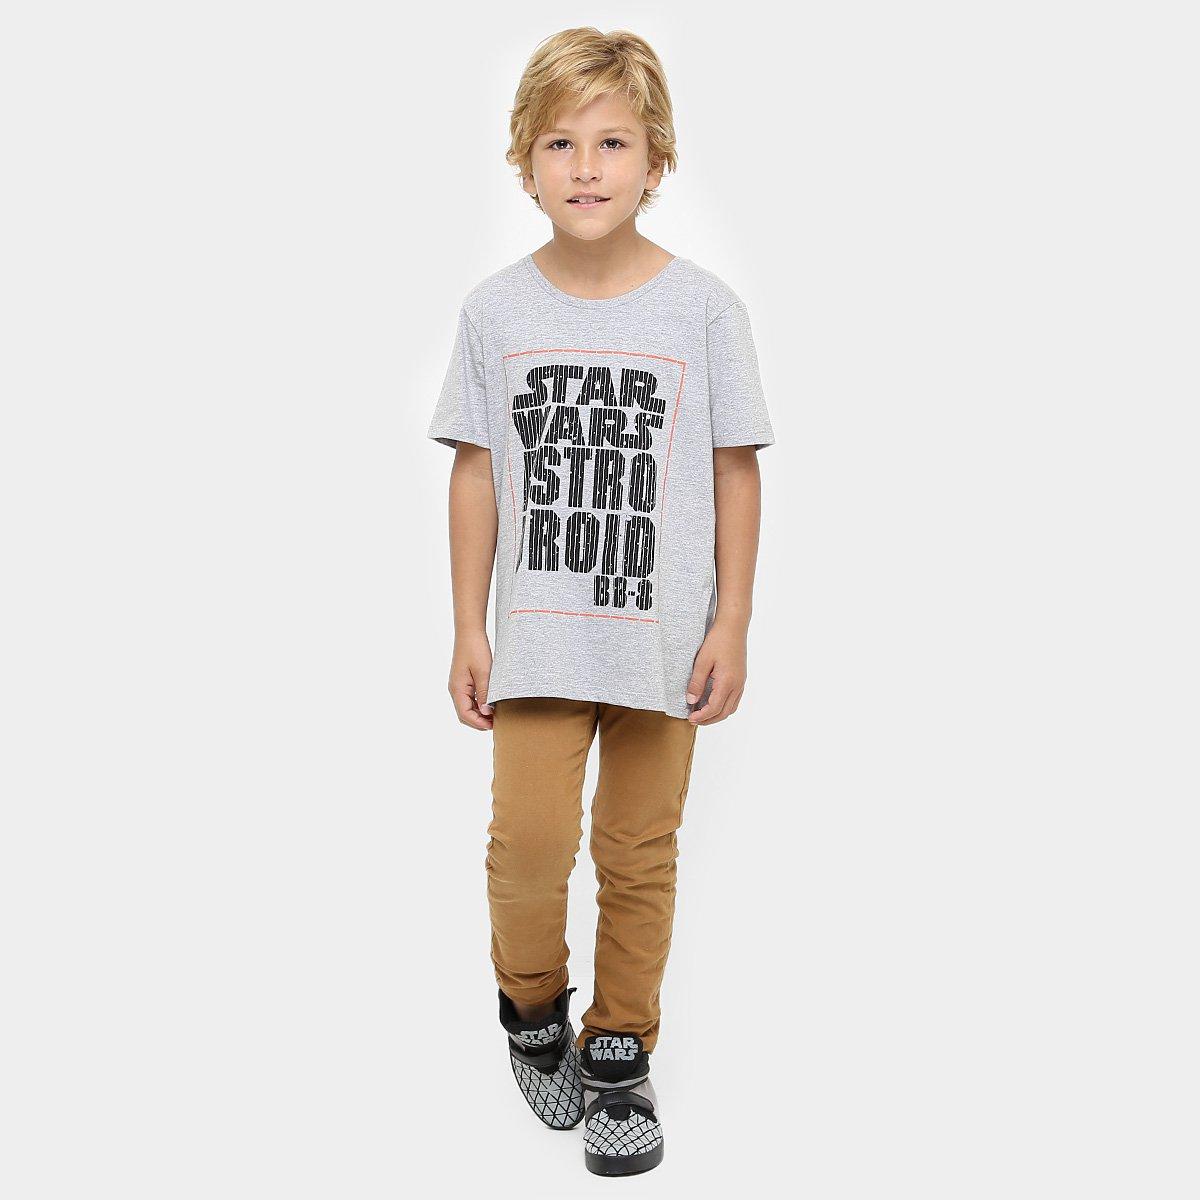 Camiseta Mescla Wars Camiseta Wars Camiseta Disney Mescla Disney Infantil Star Star Infantil Disney Star r51qr